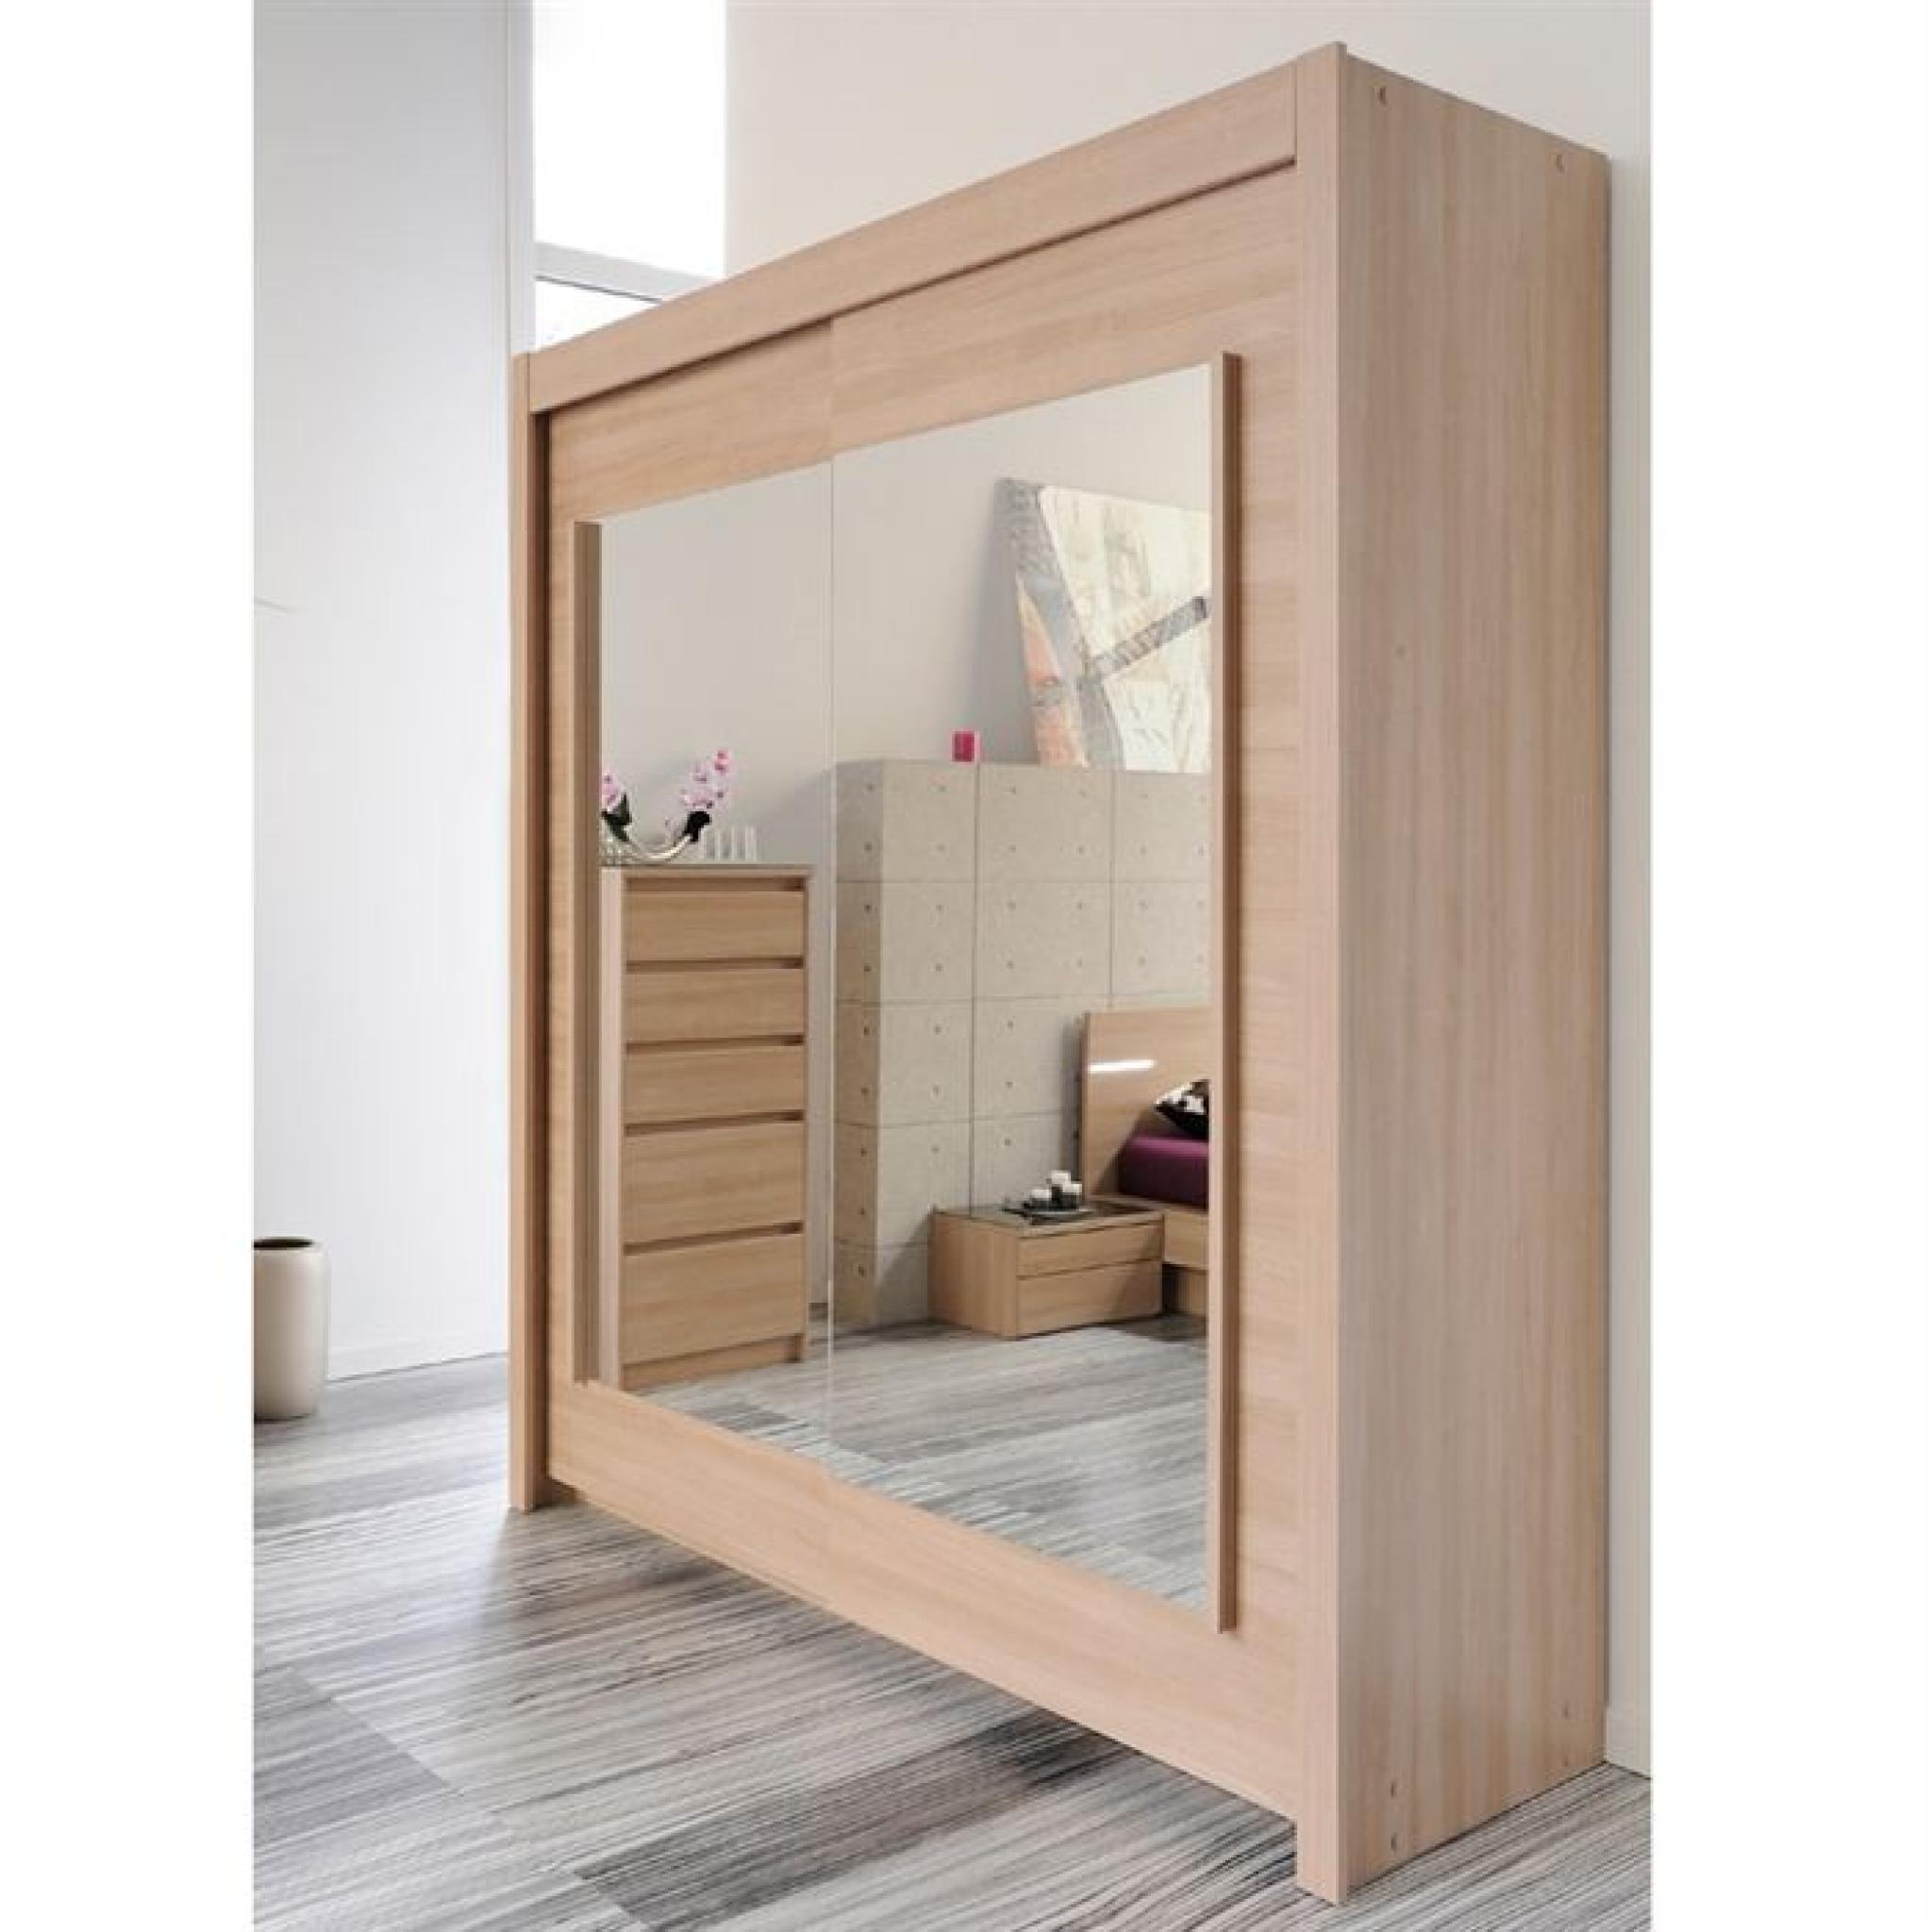 dream chambre compl te adulte lit 160 achat vente. Black Bedroom Furniture Sets. Home Design Ideas